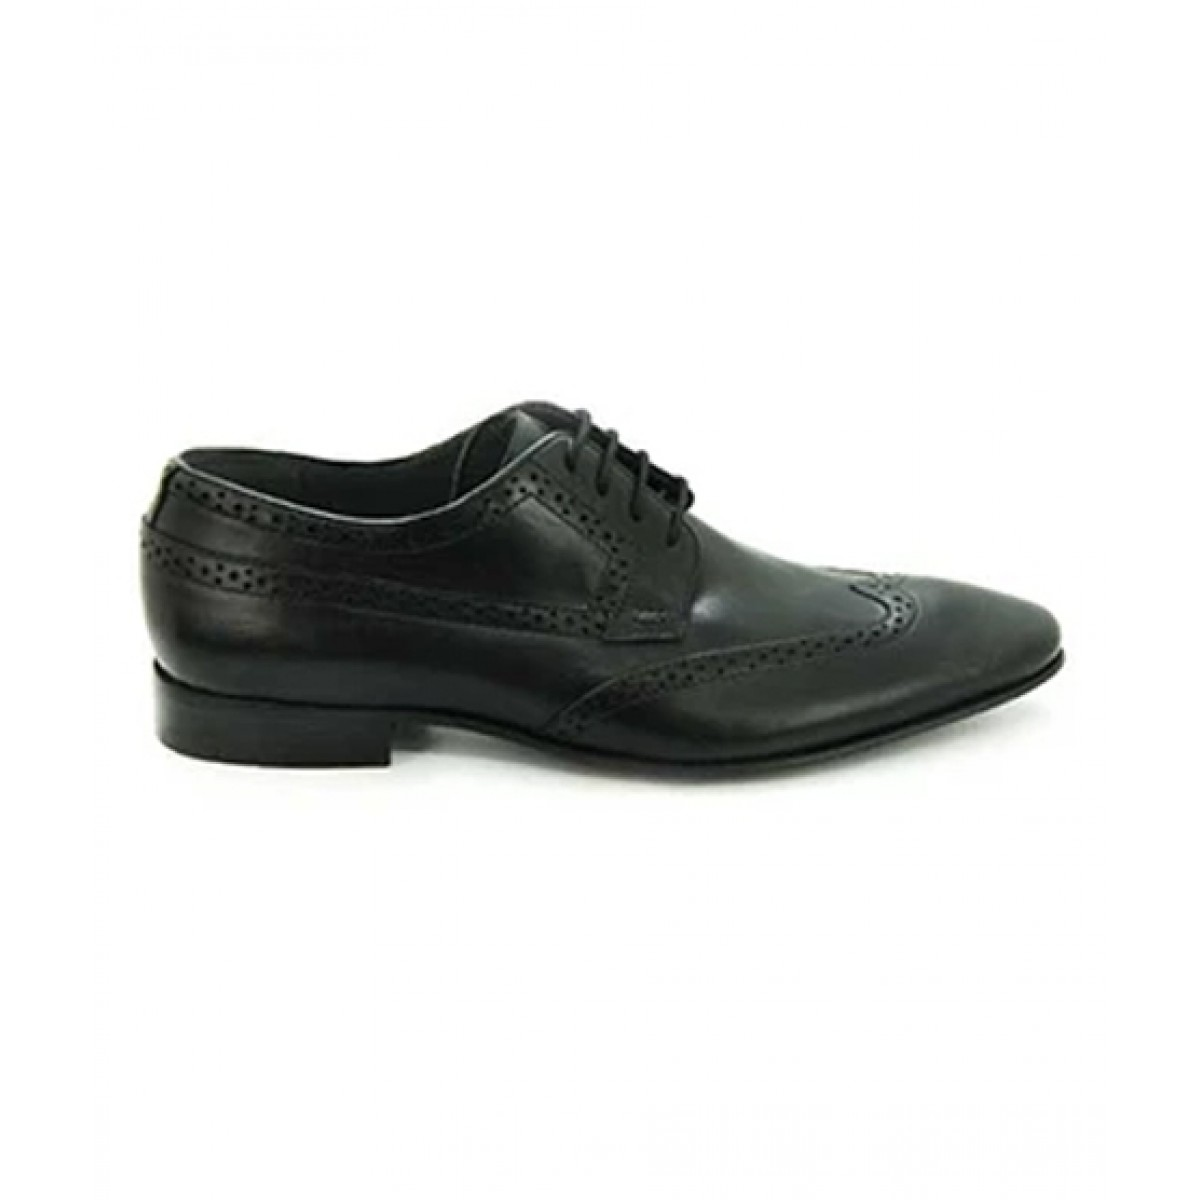 Buy Bata Ambassador Formal Shoes